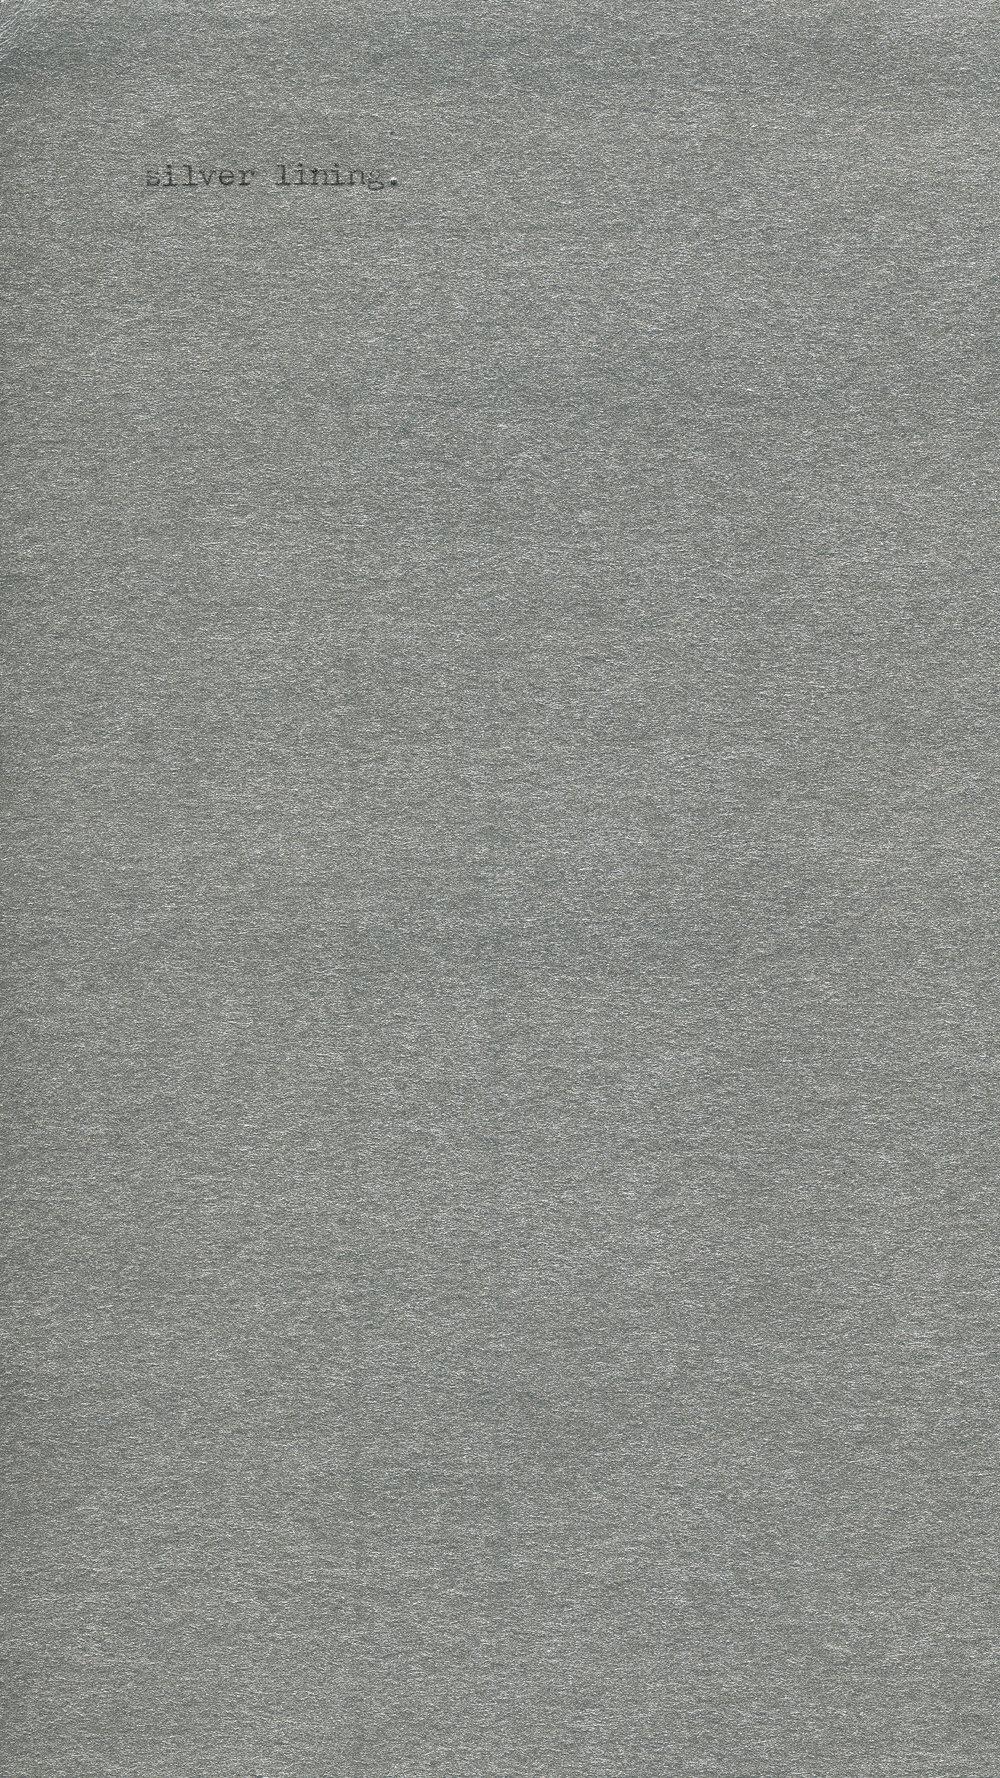 silver1.jpg